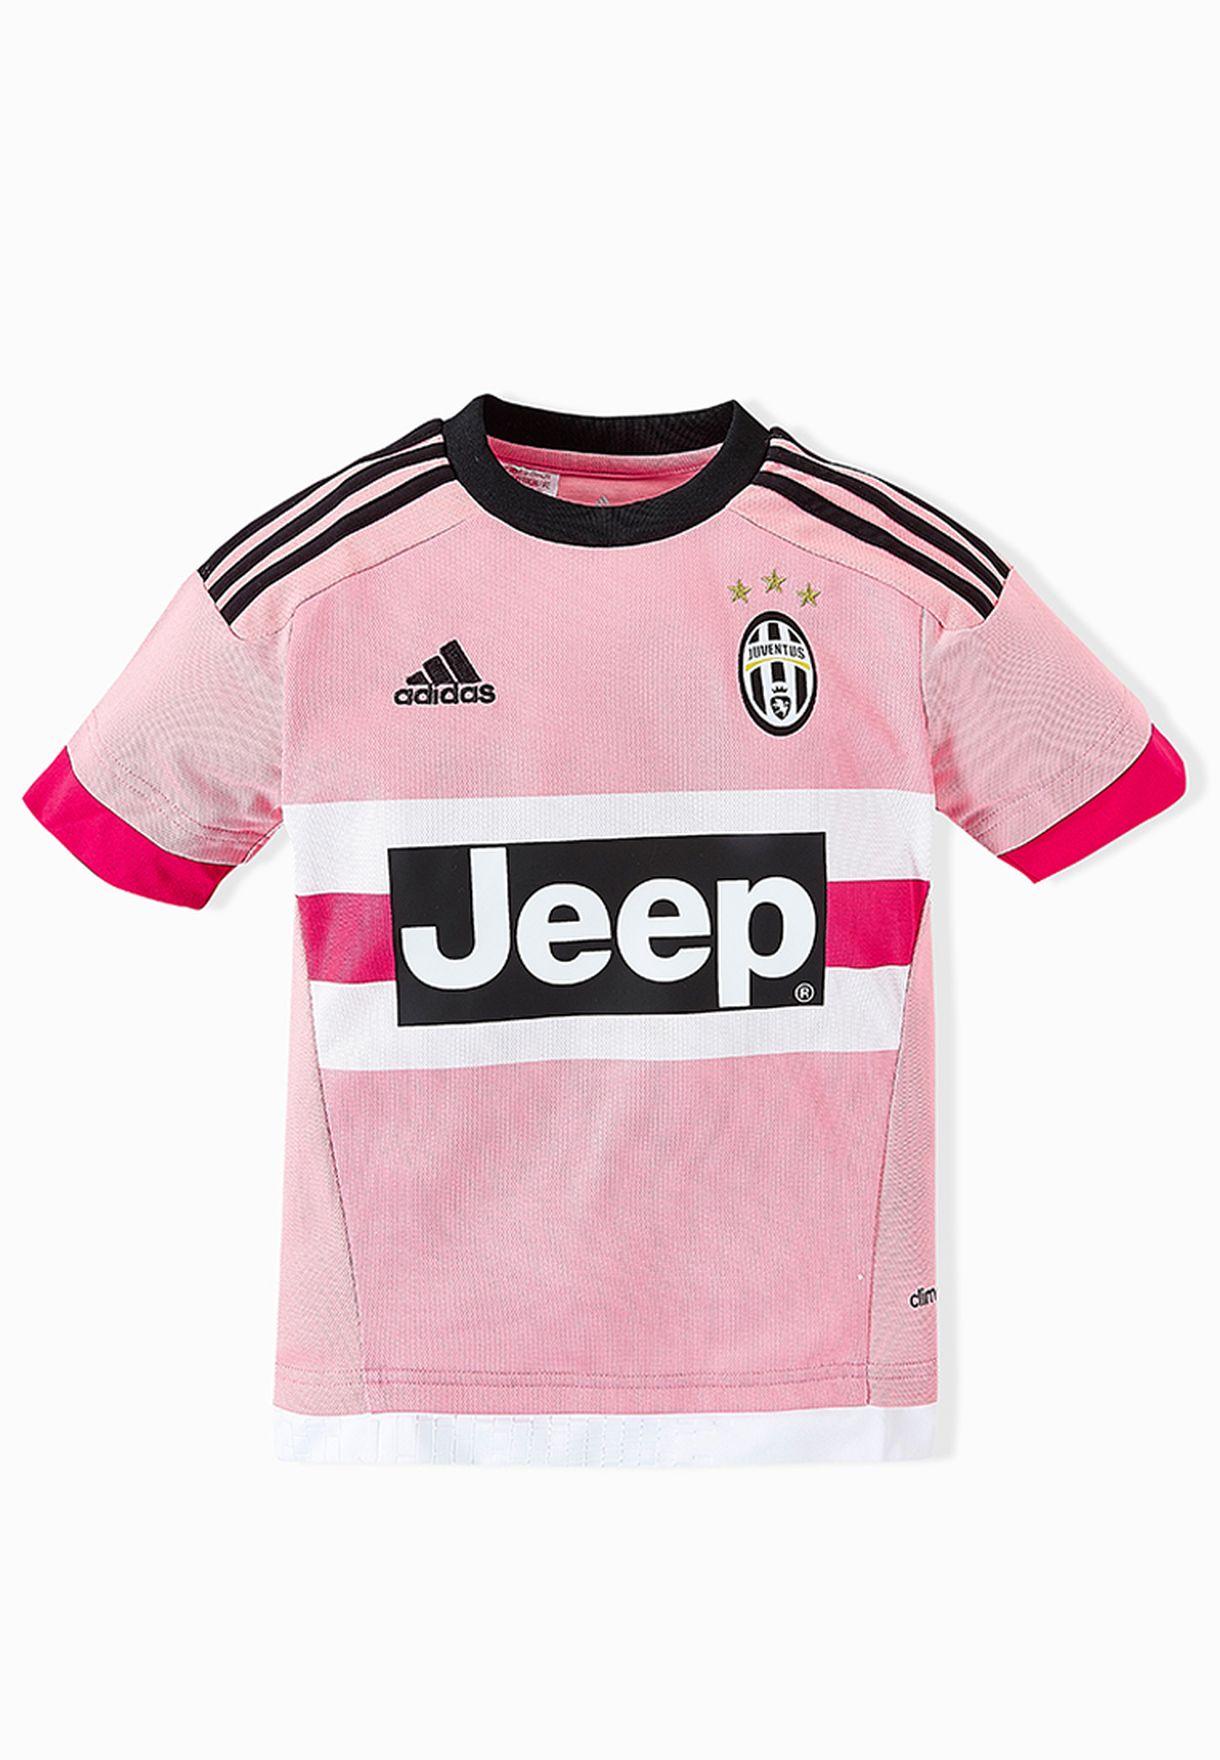 buy cheap 6326f 35dca Youth JUVE Away Jersey